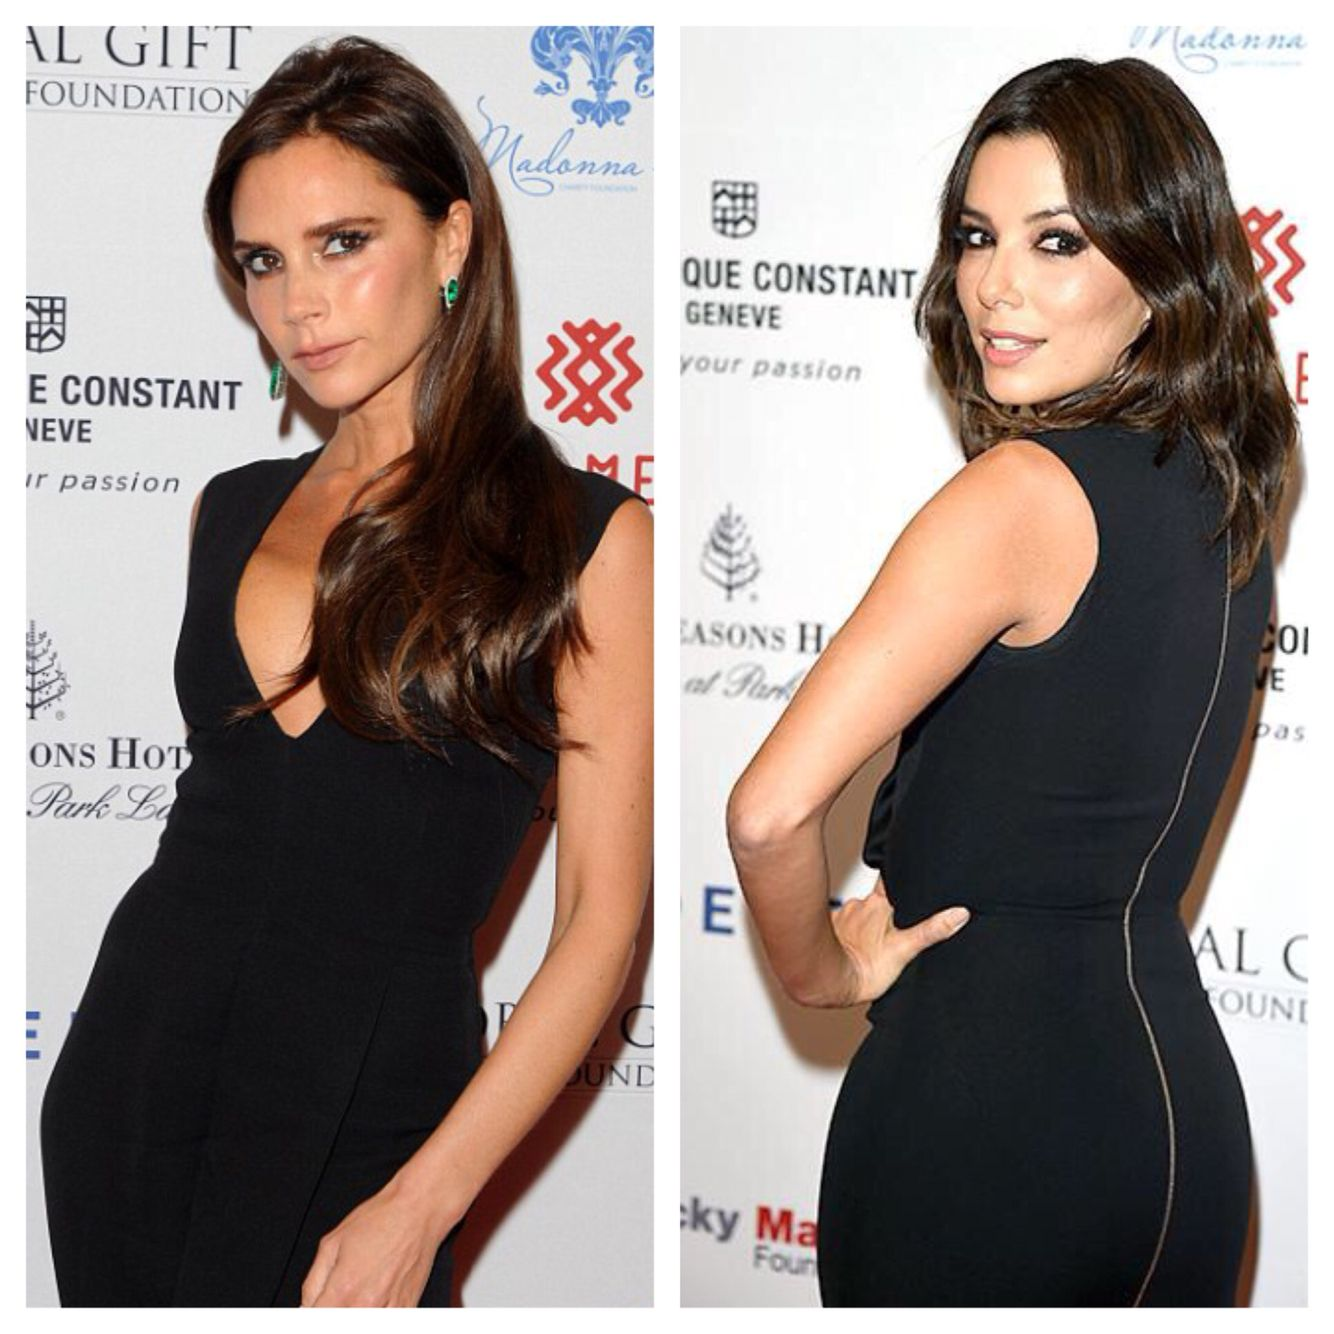 Glamour Girls Victoria Beckham and Eva Longoria hit the red carpet in London!!  Makeup: Sarah Lucero  Hair: Ken Paves